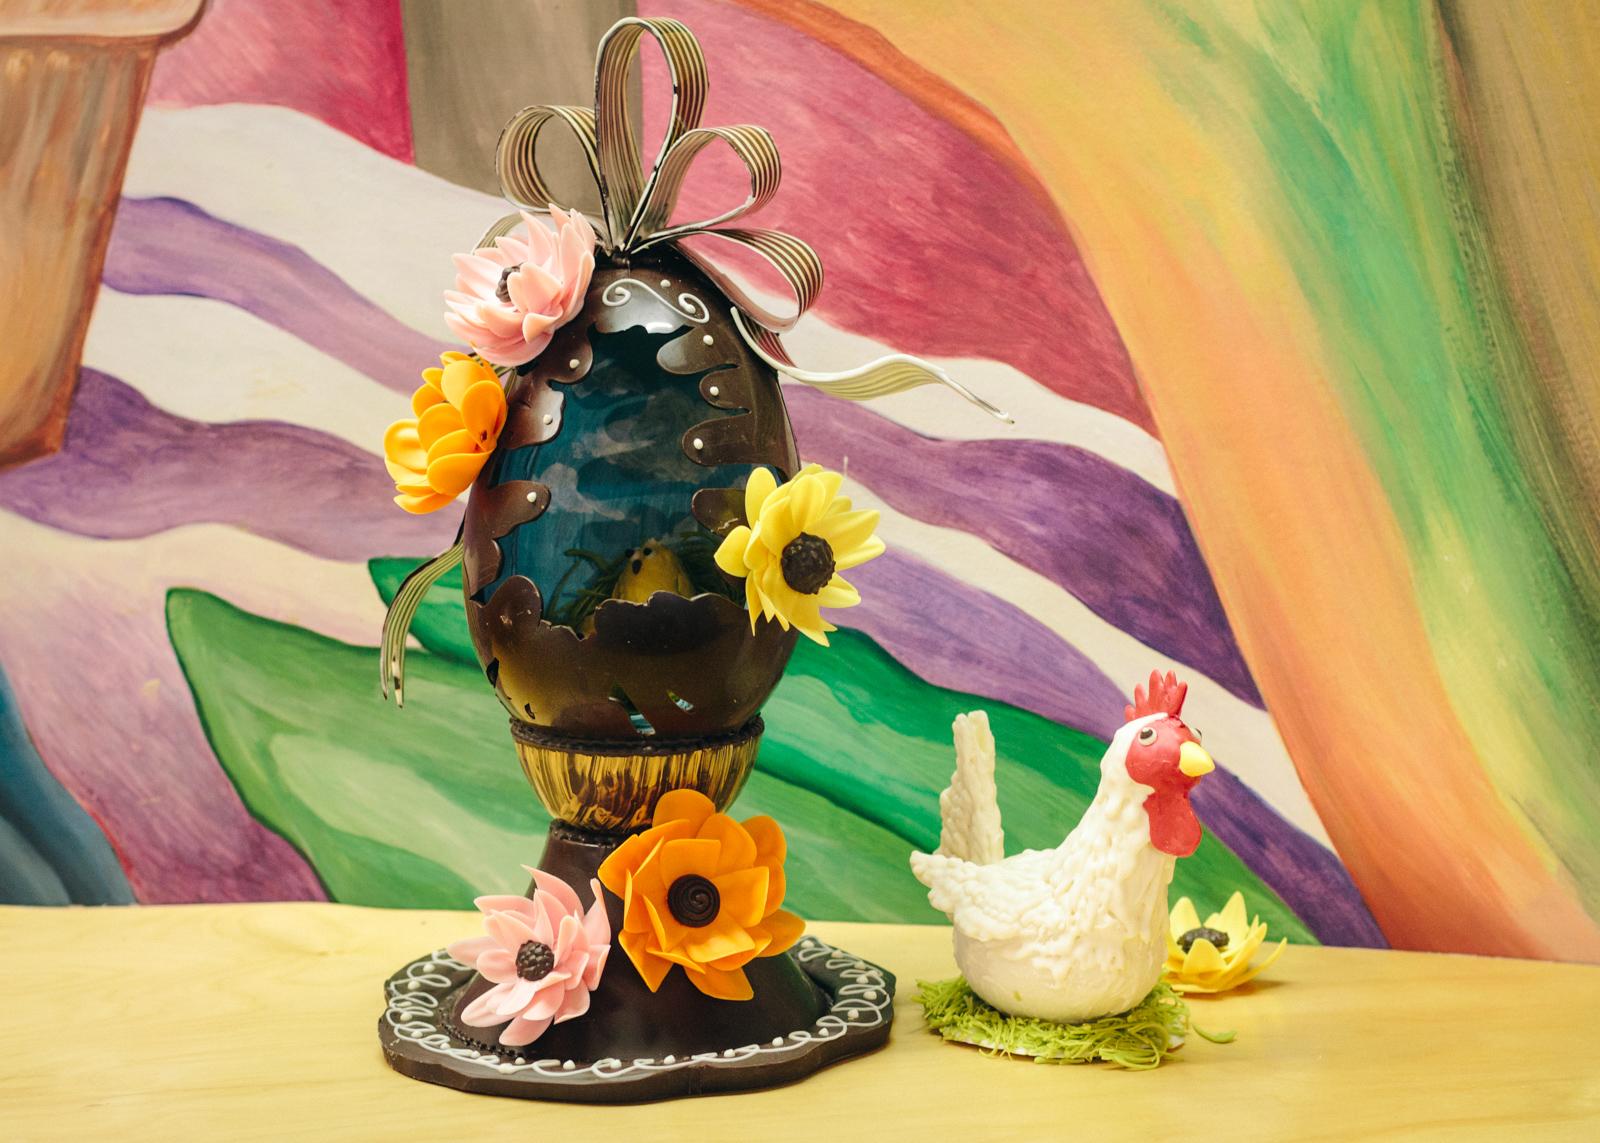 spring-chocolate-sculpture-1.jpg